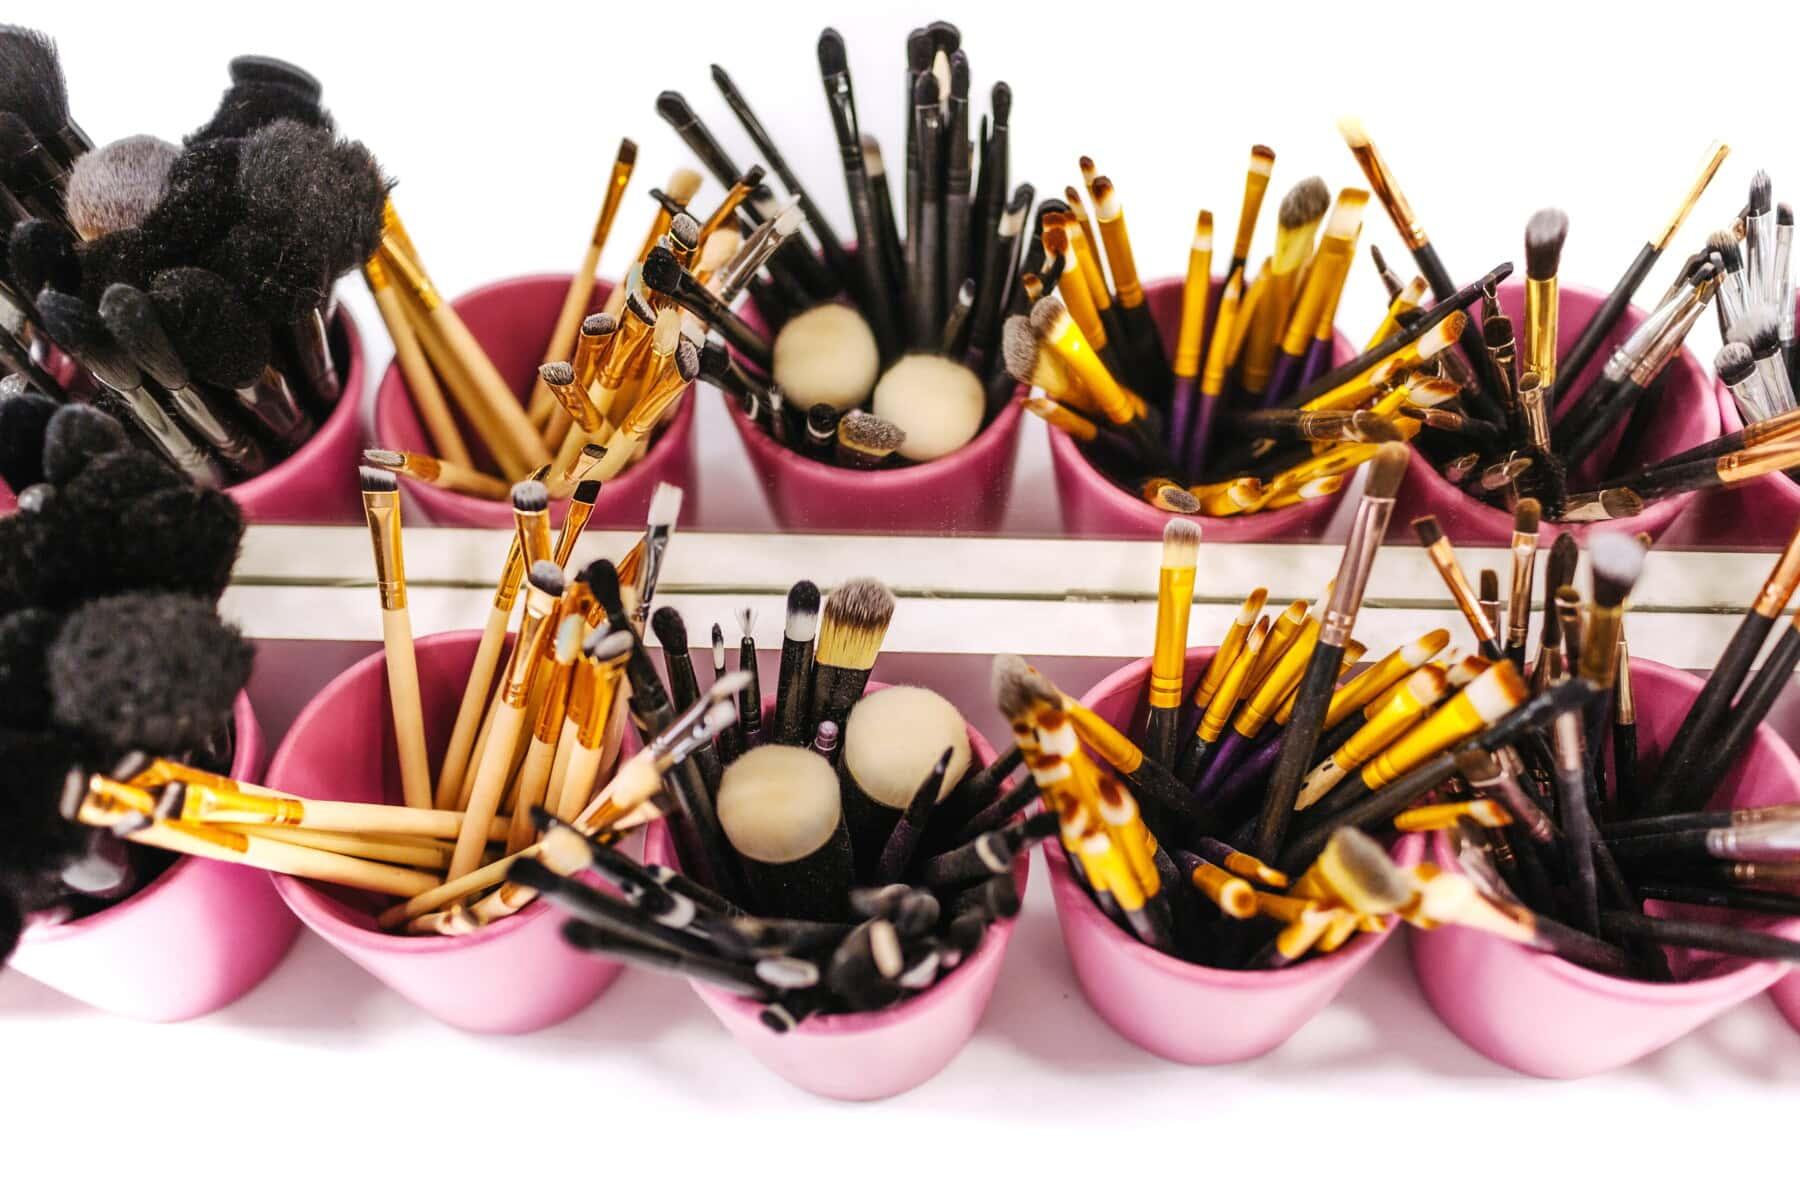 makeup, cosmetics, brush, brushes, salon, mirror, color, bright, many, equipment